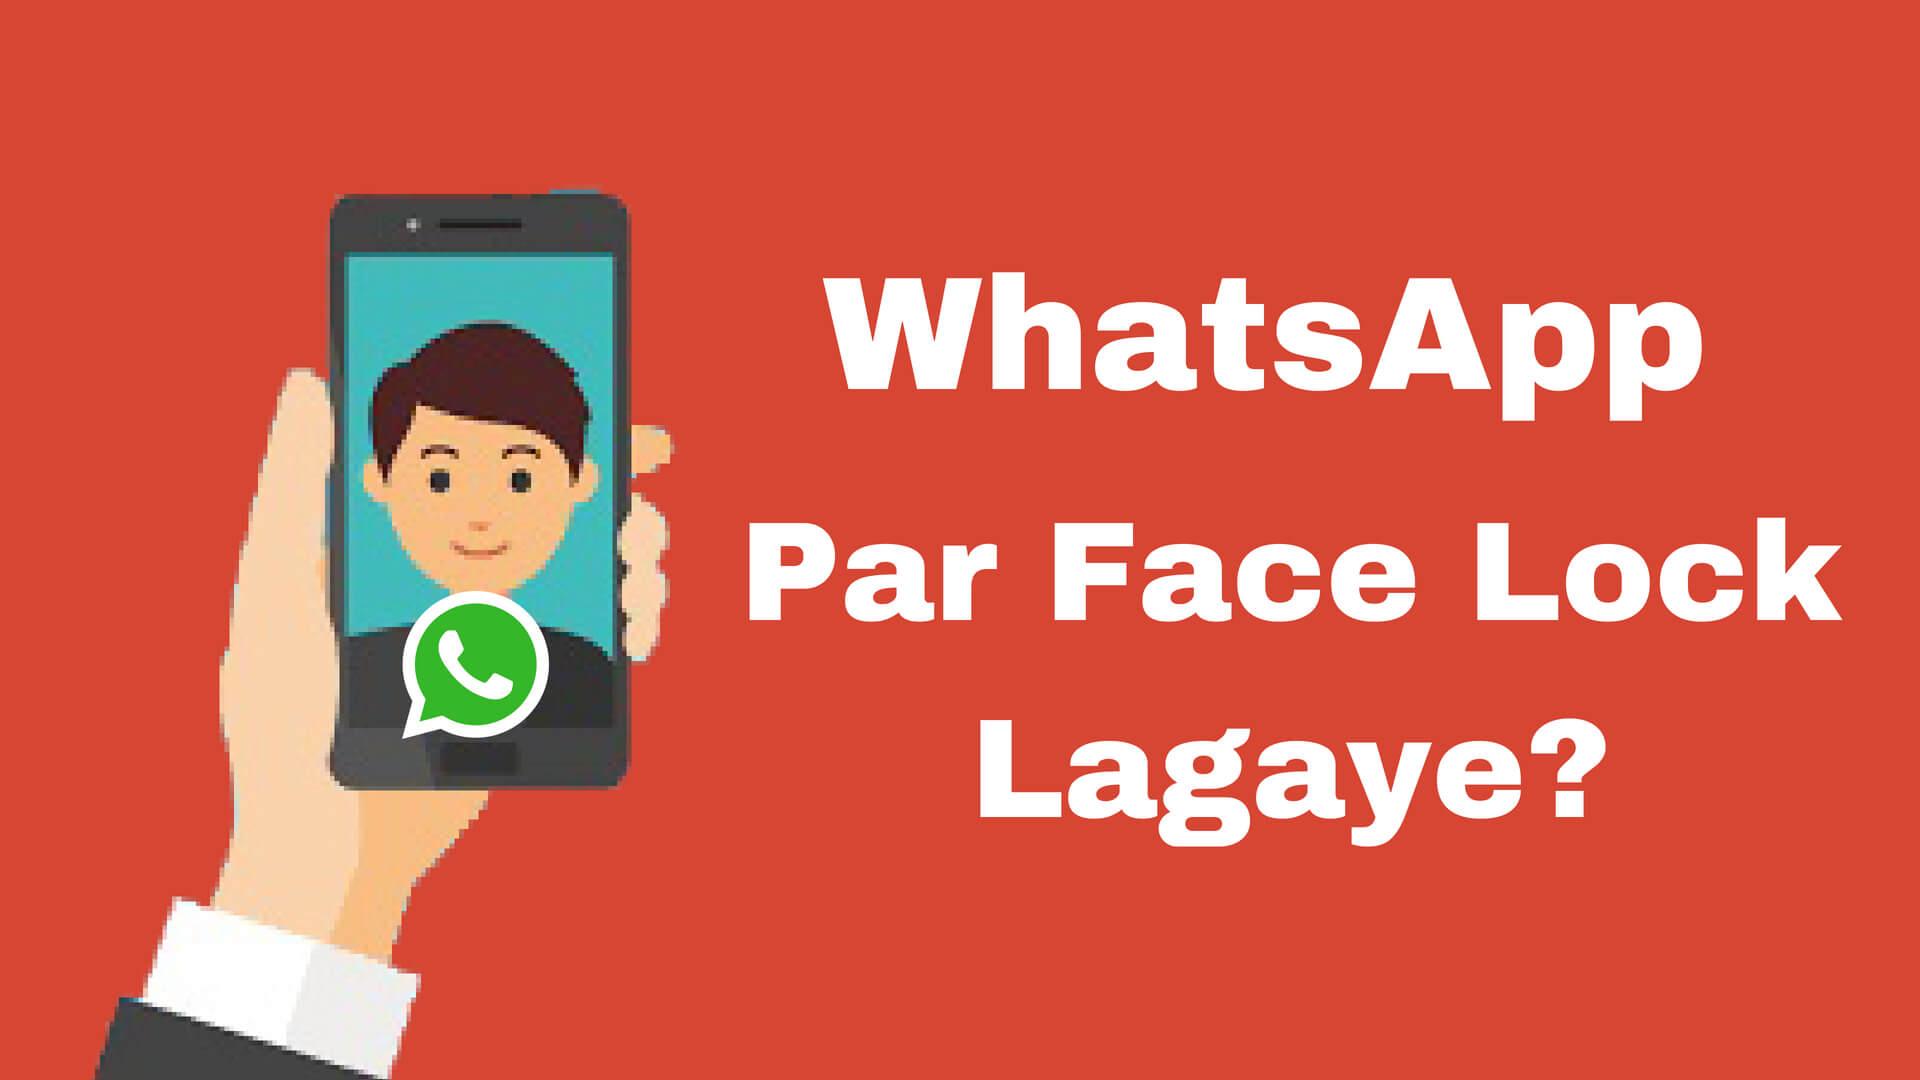 WhatsApp Face Lock